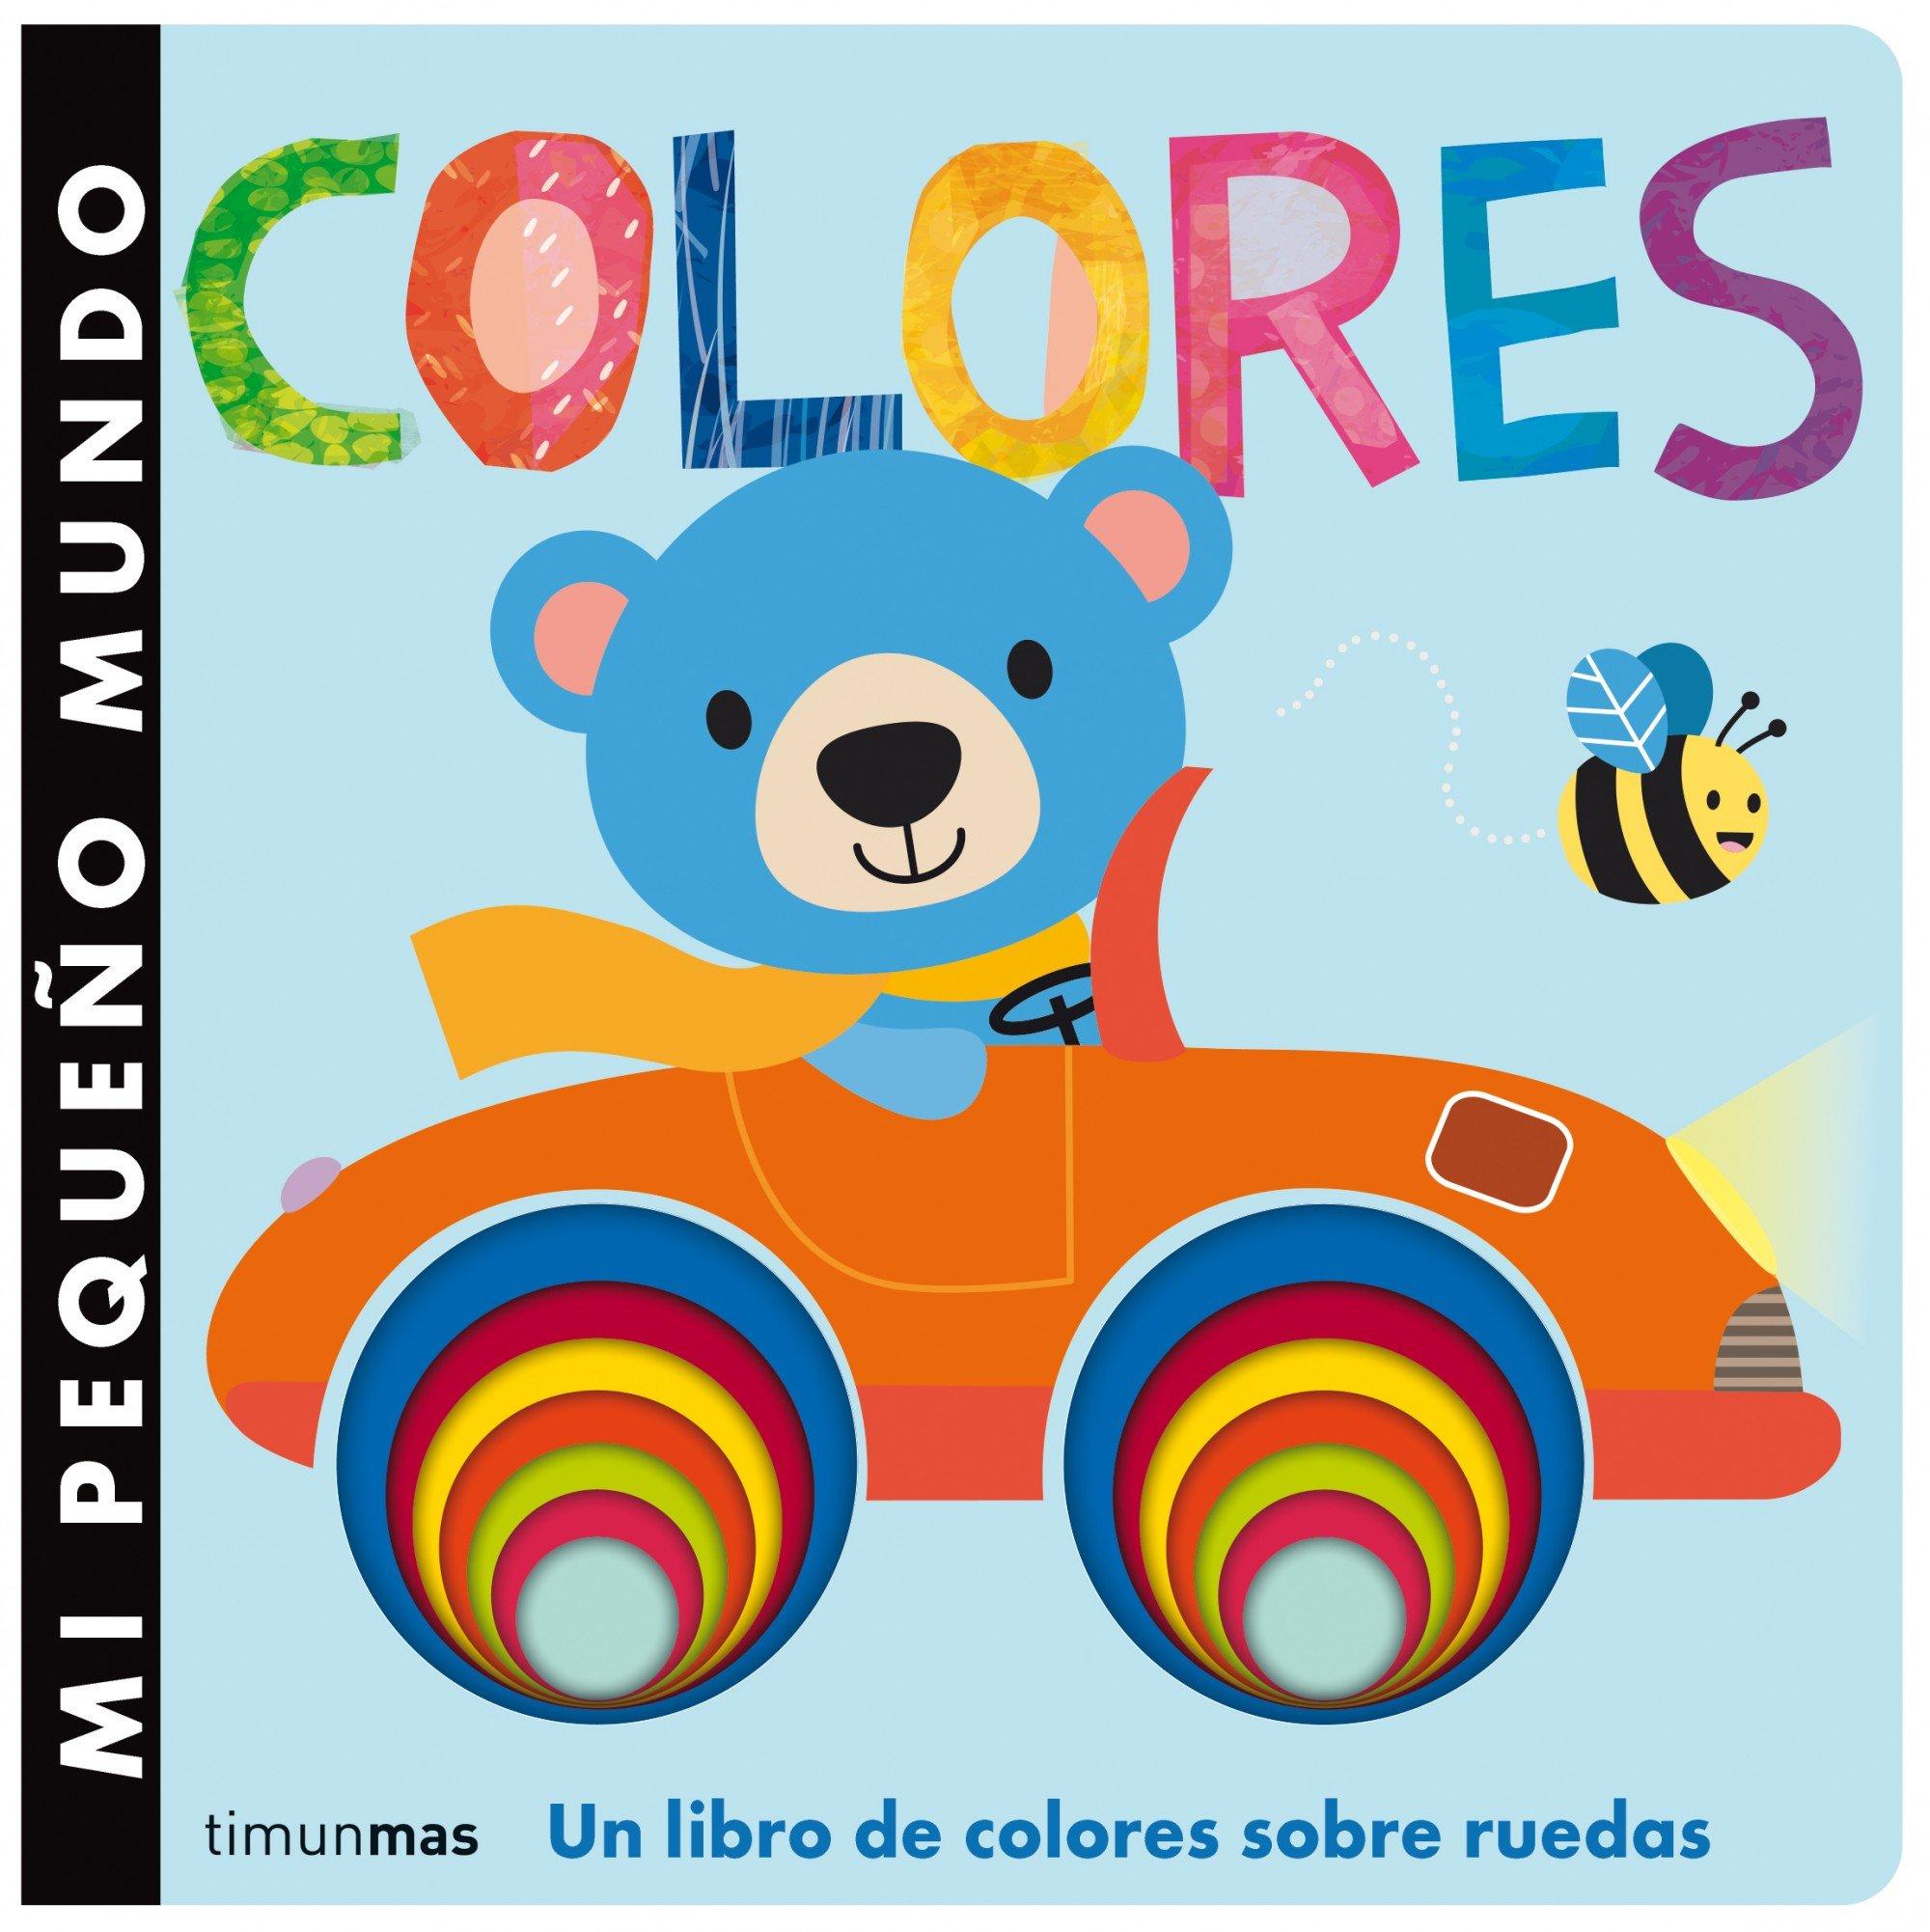 Mi pequeño mundo. Colores (Spanish Edition) (Spanish) Board book – January 30, 2015